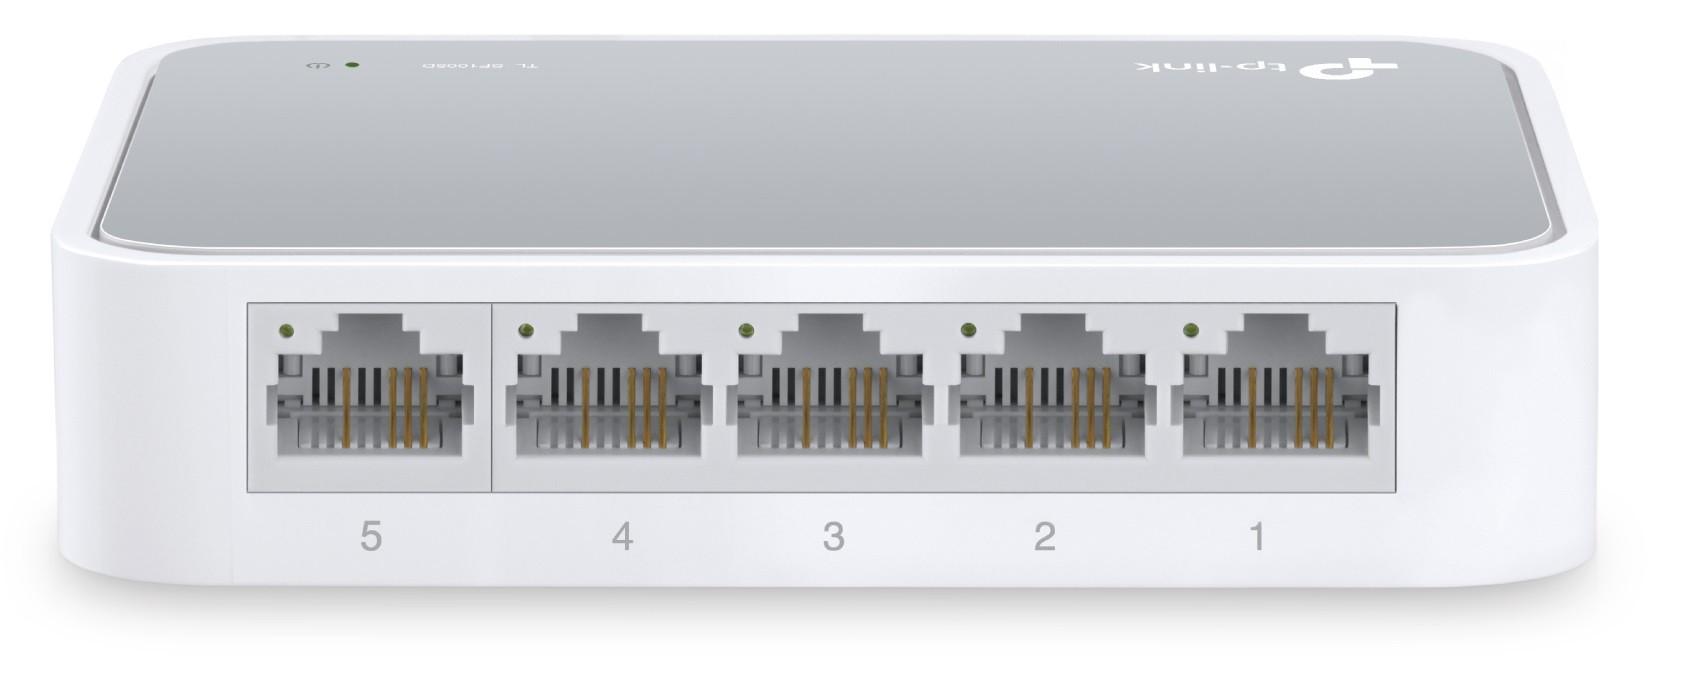 Switch 5 Portas JetStream 05 10/100 L2 NG TL-SF1005D TP-Link   - Eletroinfocia